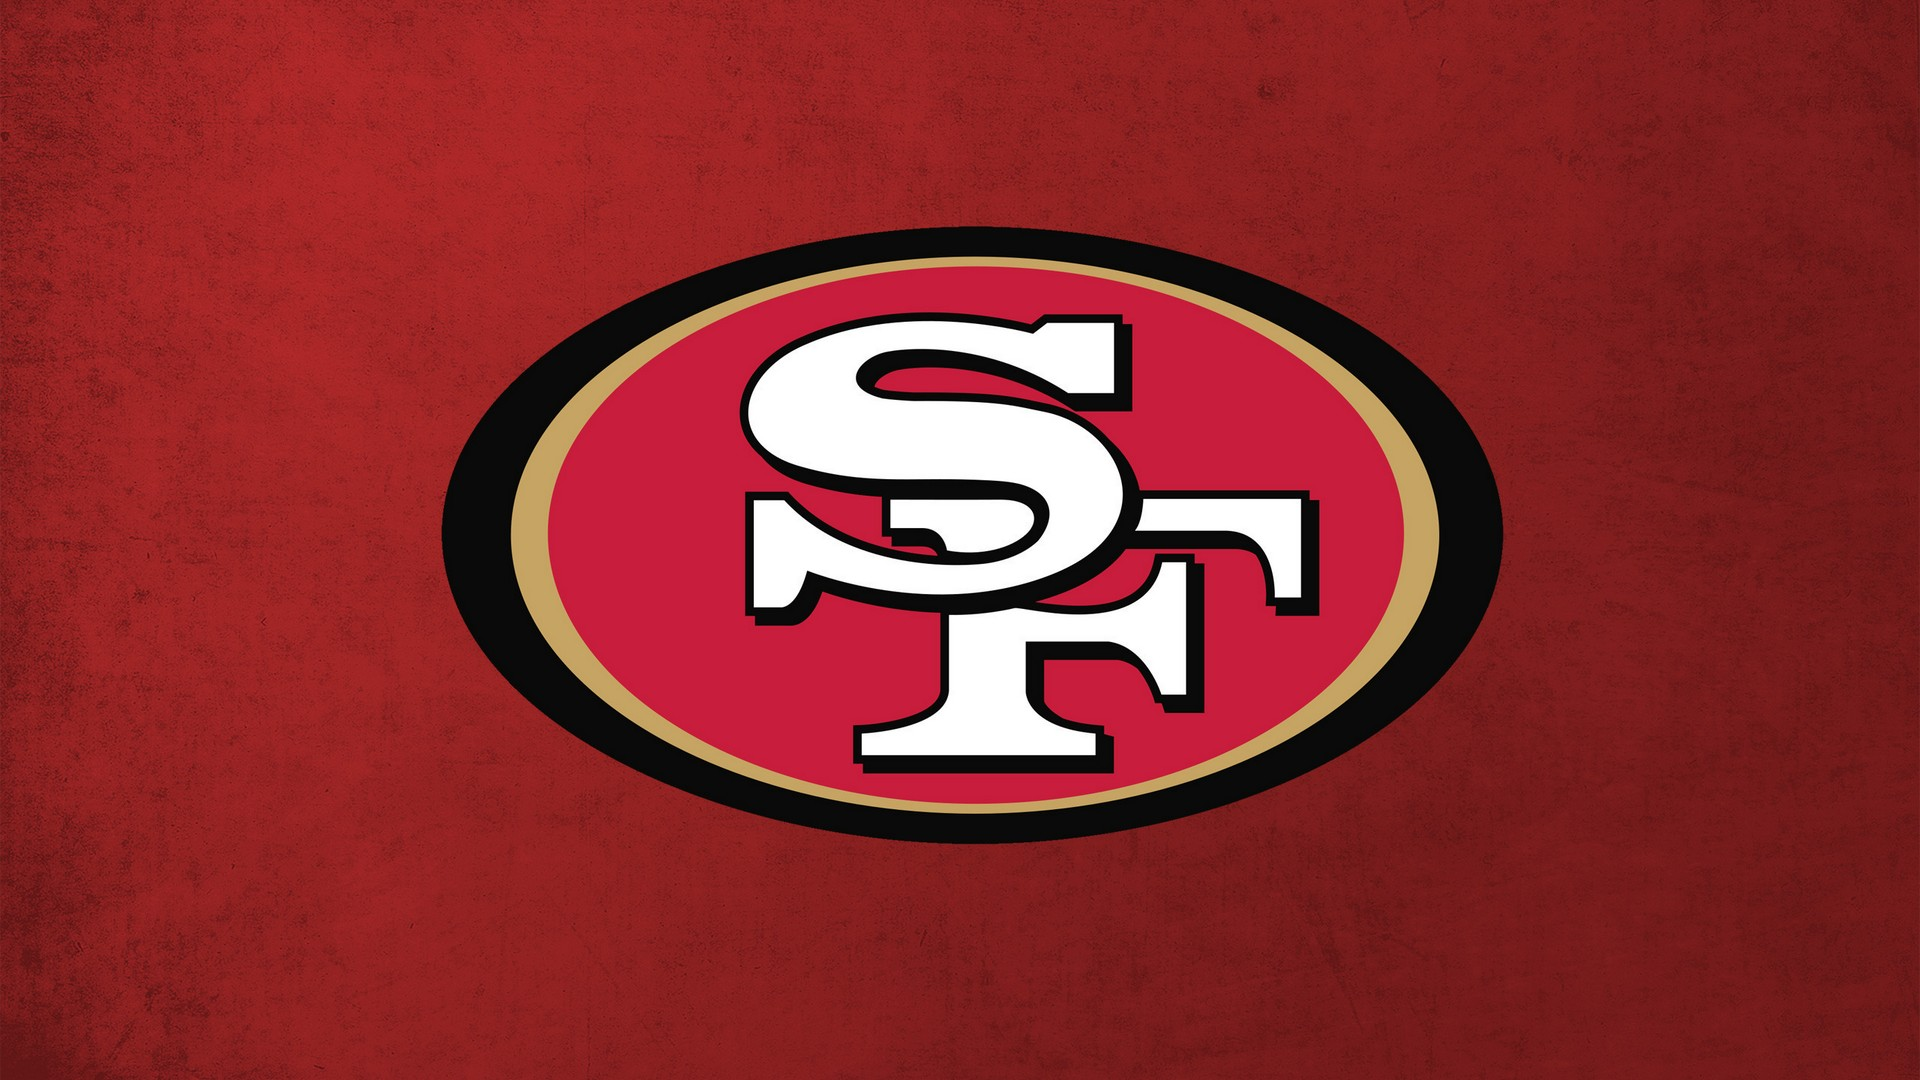 San Francisco 49ers Wallpaper HD 2020 NFL Football Wallpapers 1920x1080